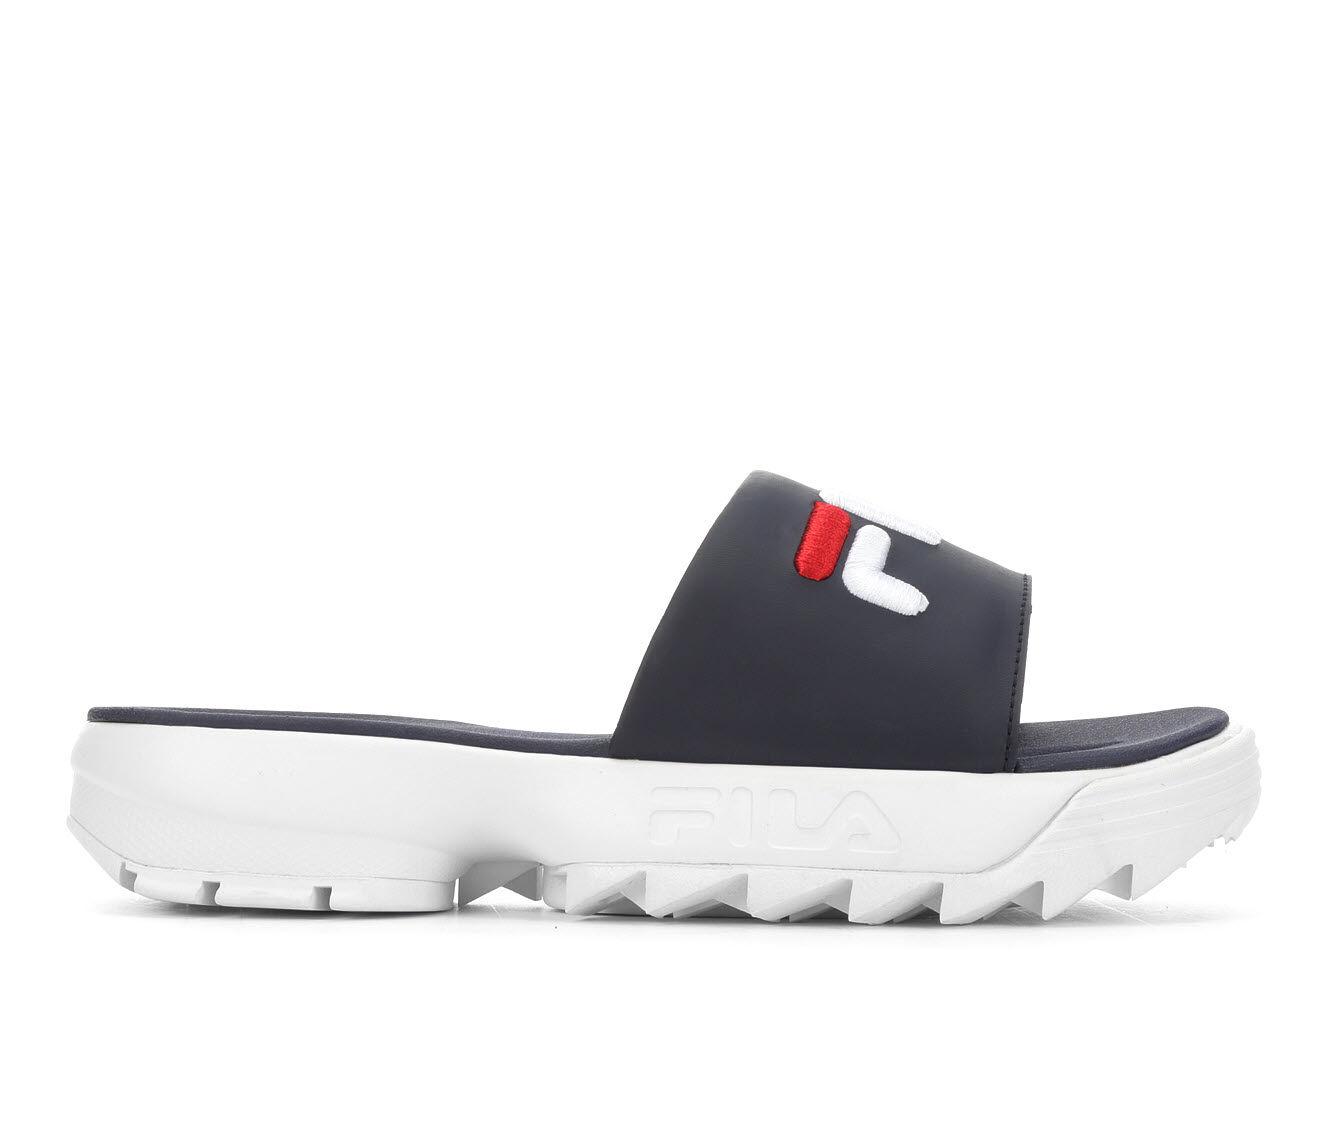 Women's Fila Disruptor Bold Slide Flatform Sandals Navy/White/Red